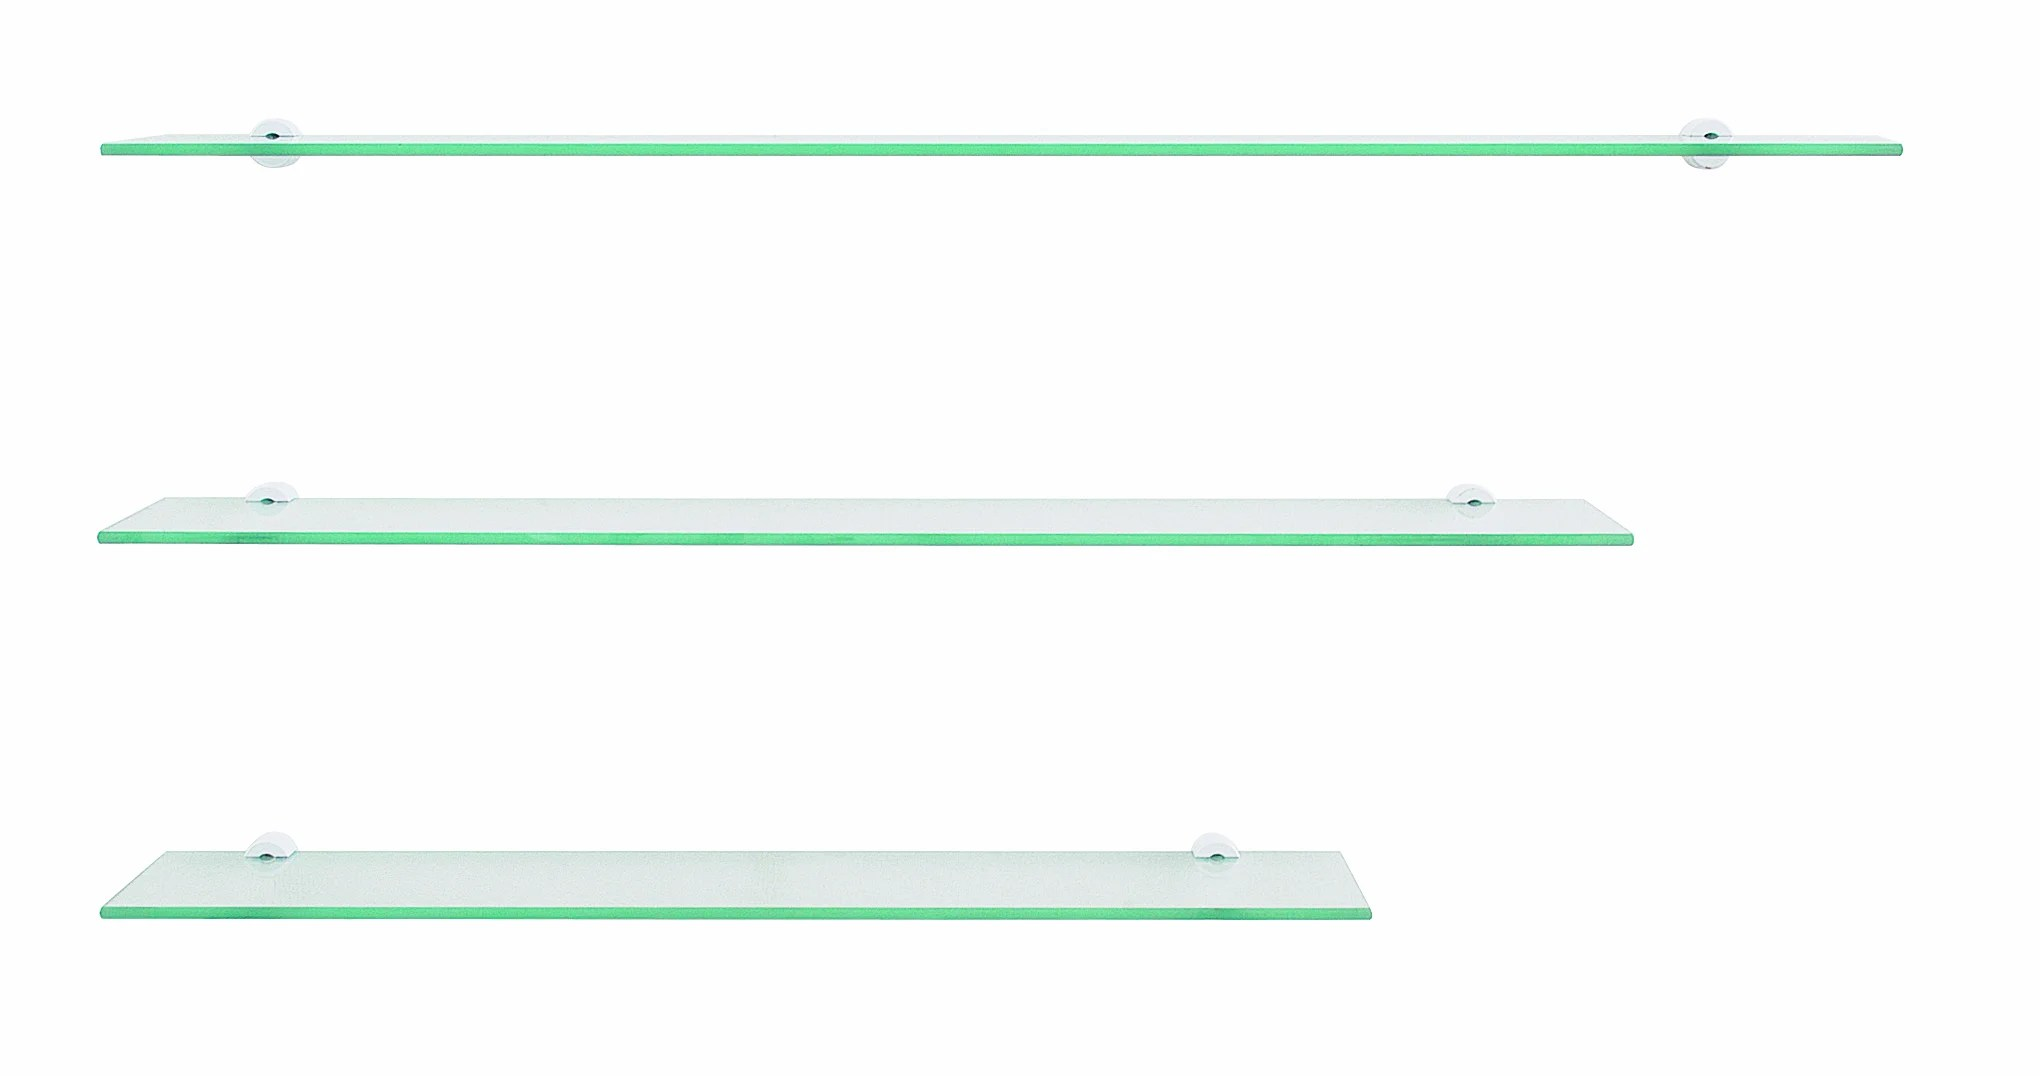 Tablette 70x12 Cm Rectangulaire Verre Simple Leroy Merlin